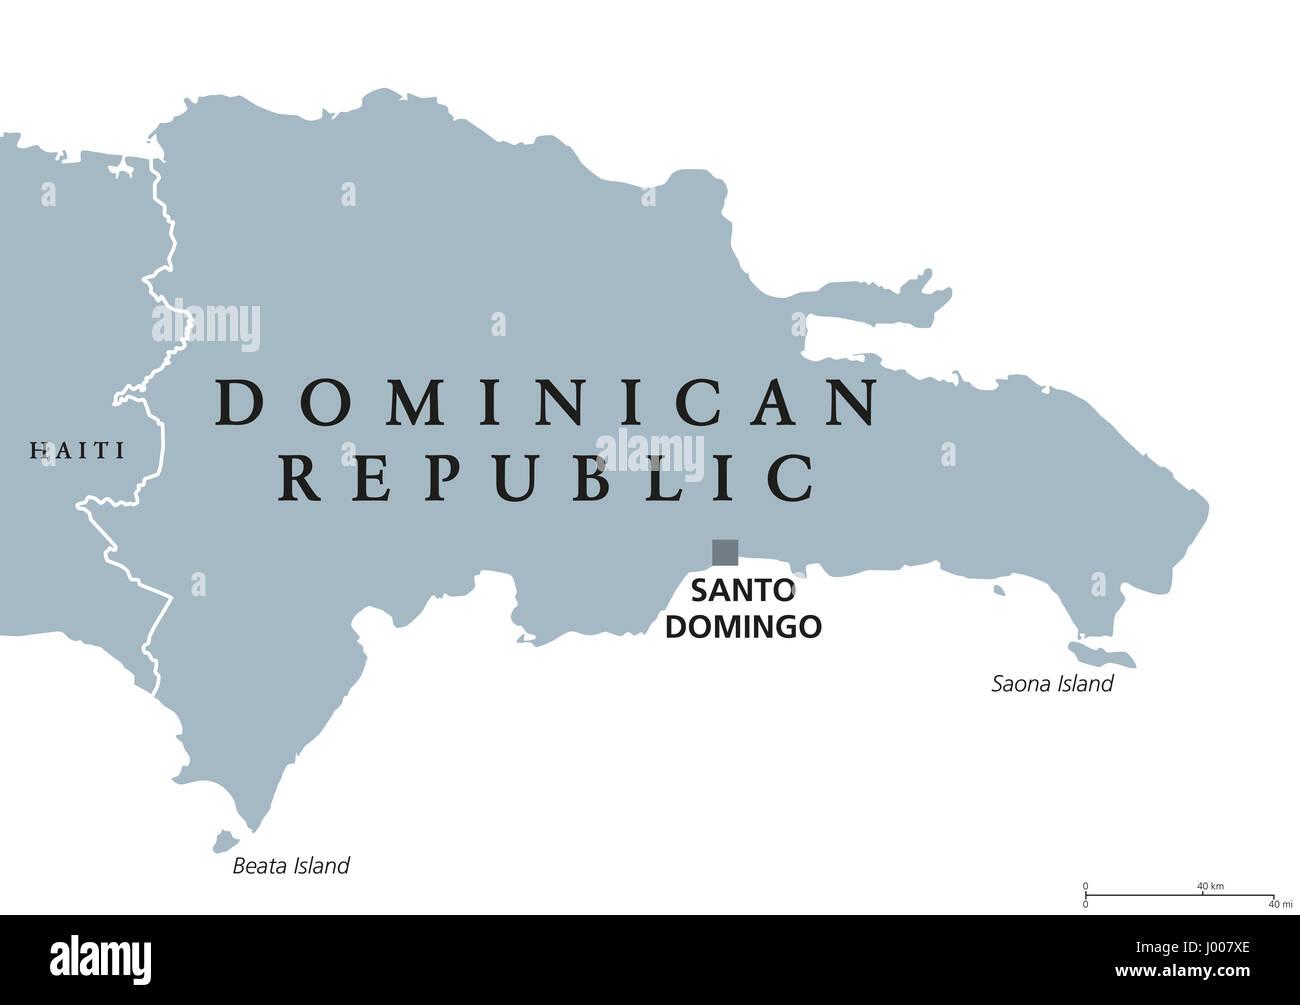 Dominican Republic Political Map With Capital Santo Domingo Stock